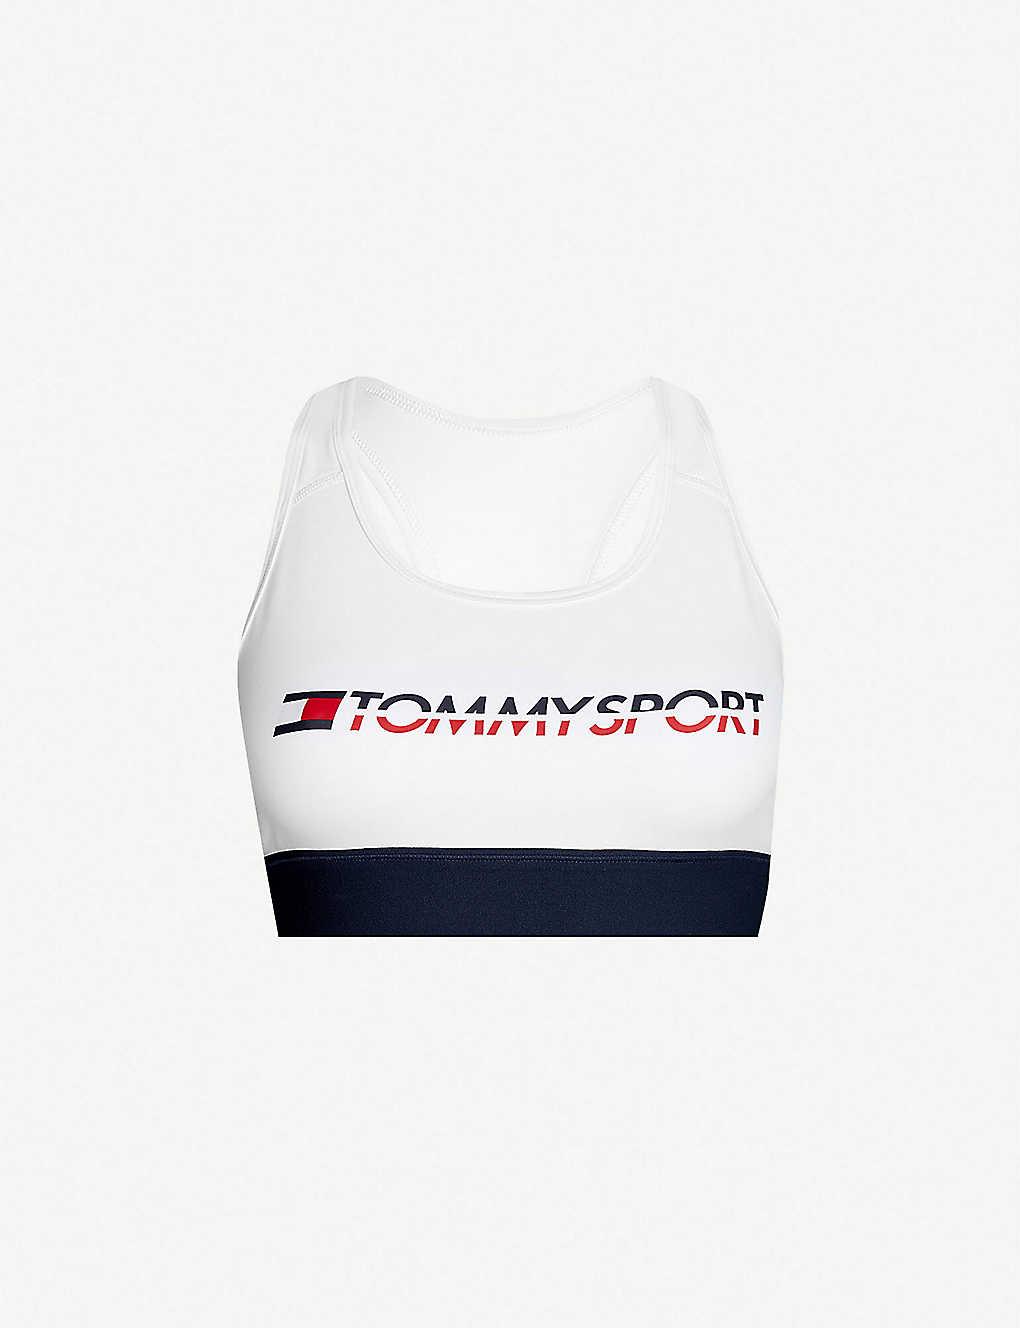 03f55c5d TOMMY HILFIGER - Logo-print stretch-jersey sports bra | Selfridges.com